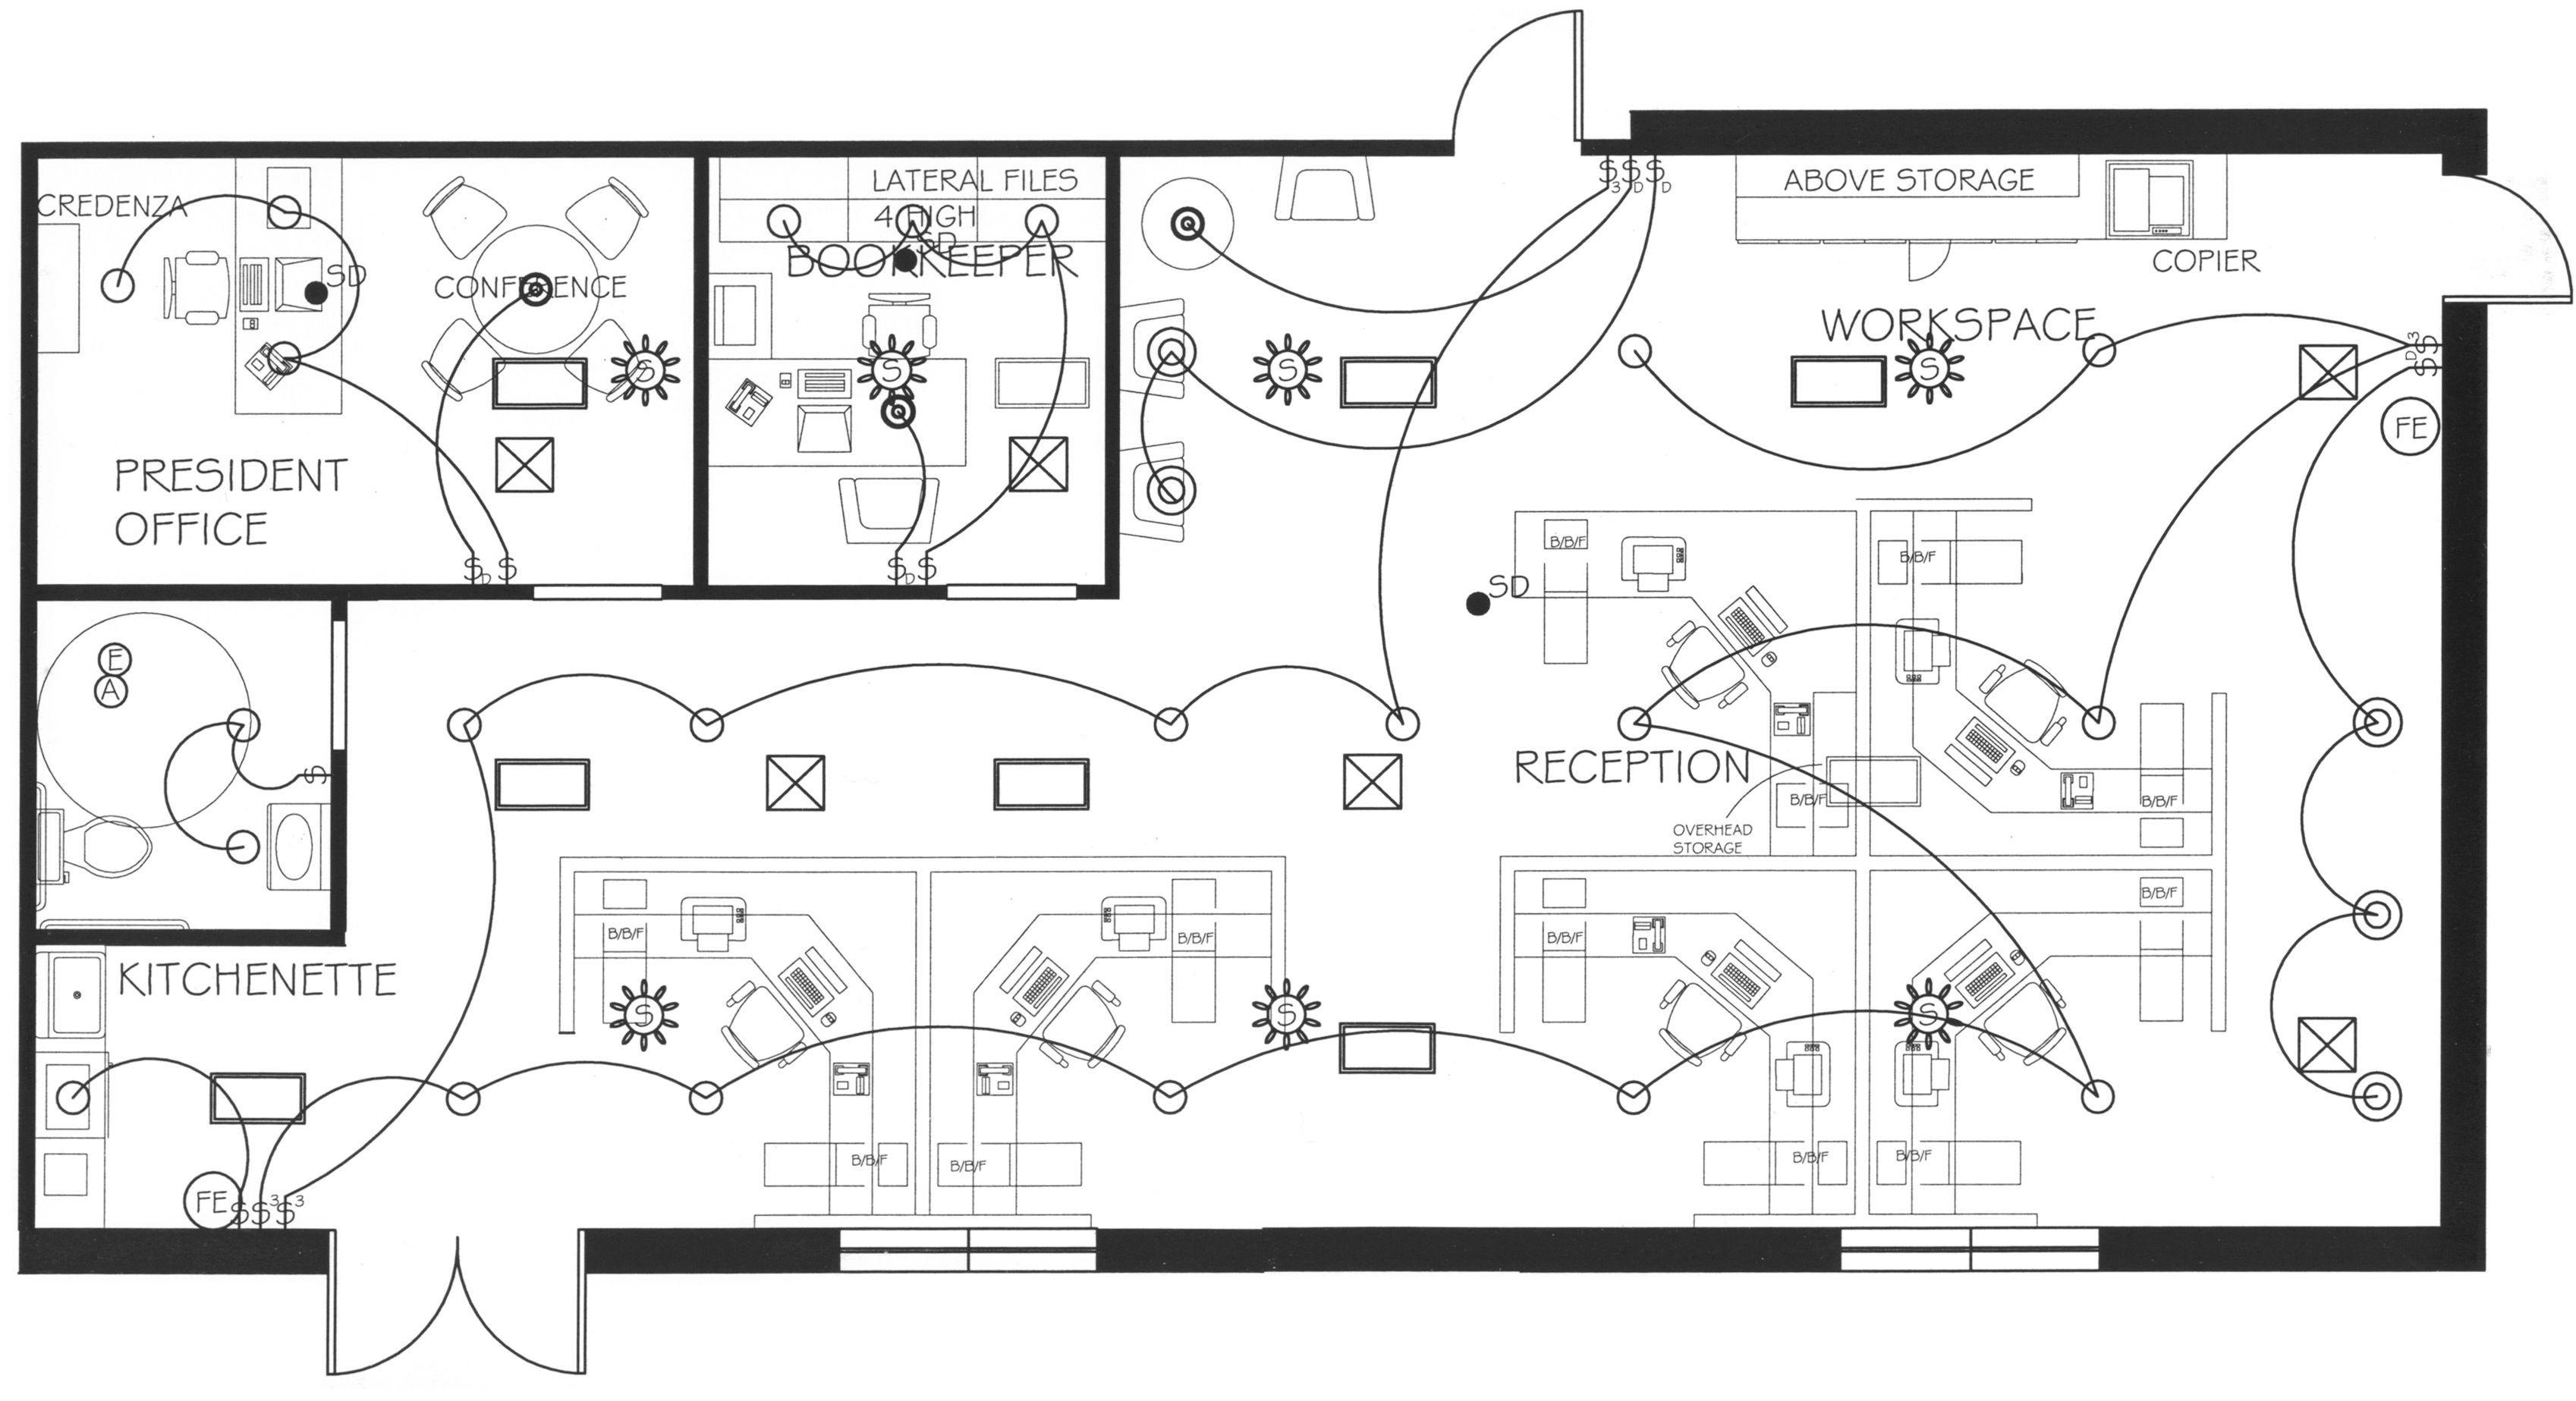 new electrical floor plan sample diagram wiringdiagram diagramming diagramm visuals  [ 3395 x 1847 Pixel ]